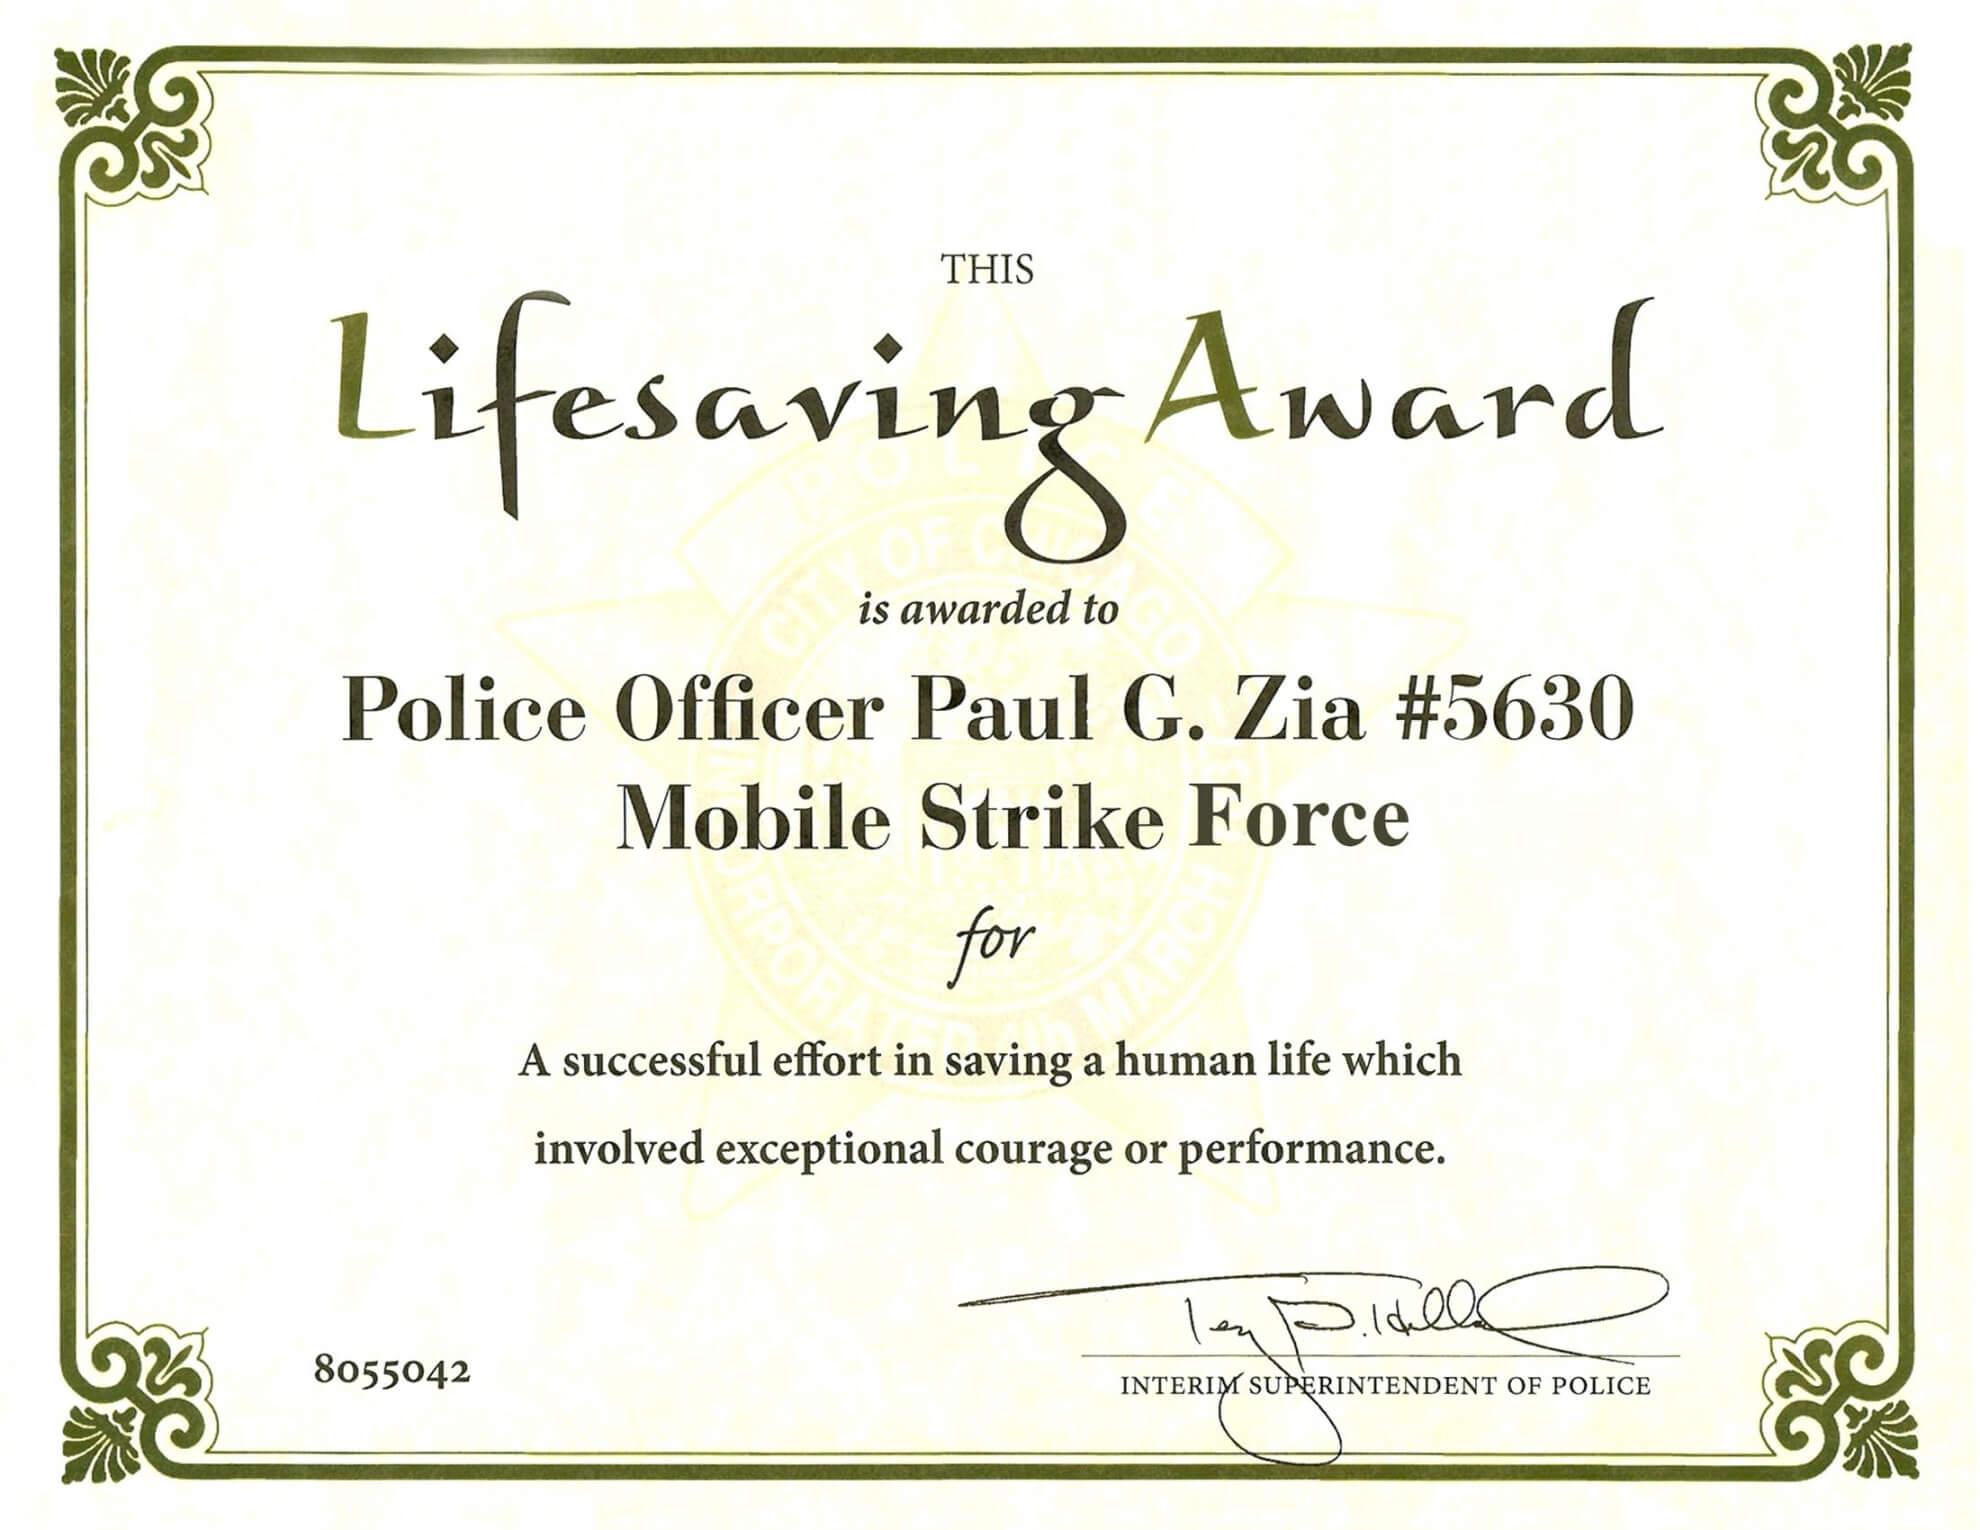 Free Certificate Of Performance Template 7 Elsik Blue Cetane Throughout Life Saving Award Certificate Template